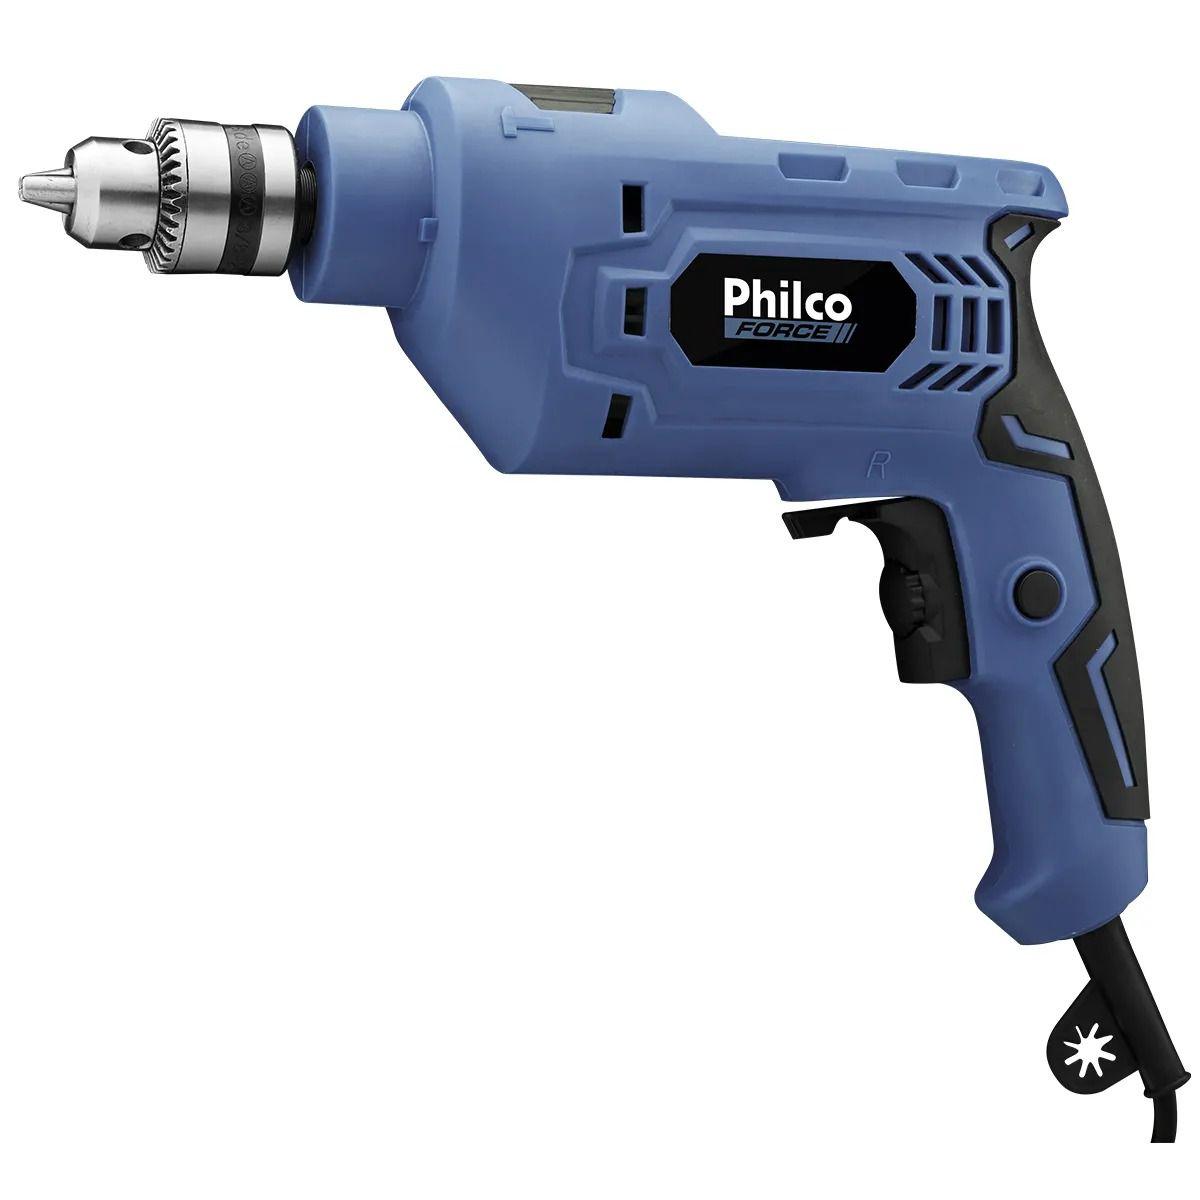 Furadeira de Impacto Philco Force PFU01 – 650W